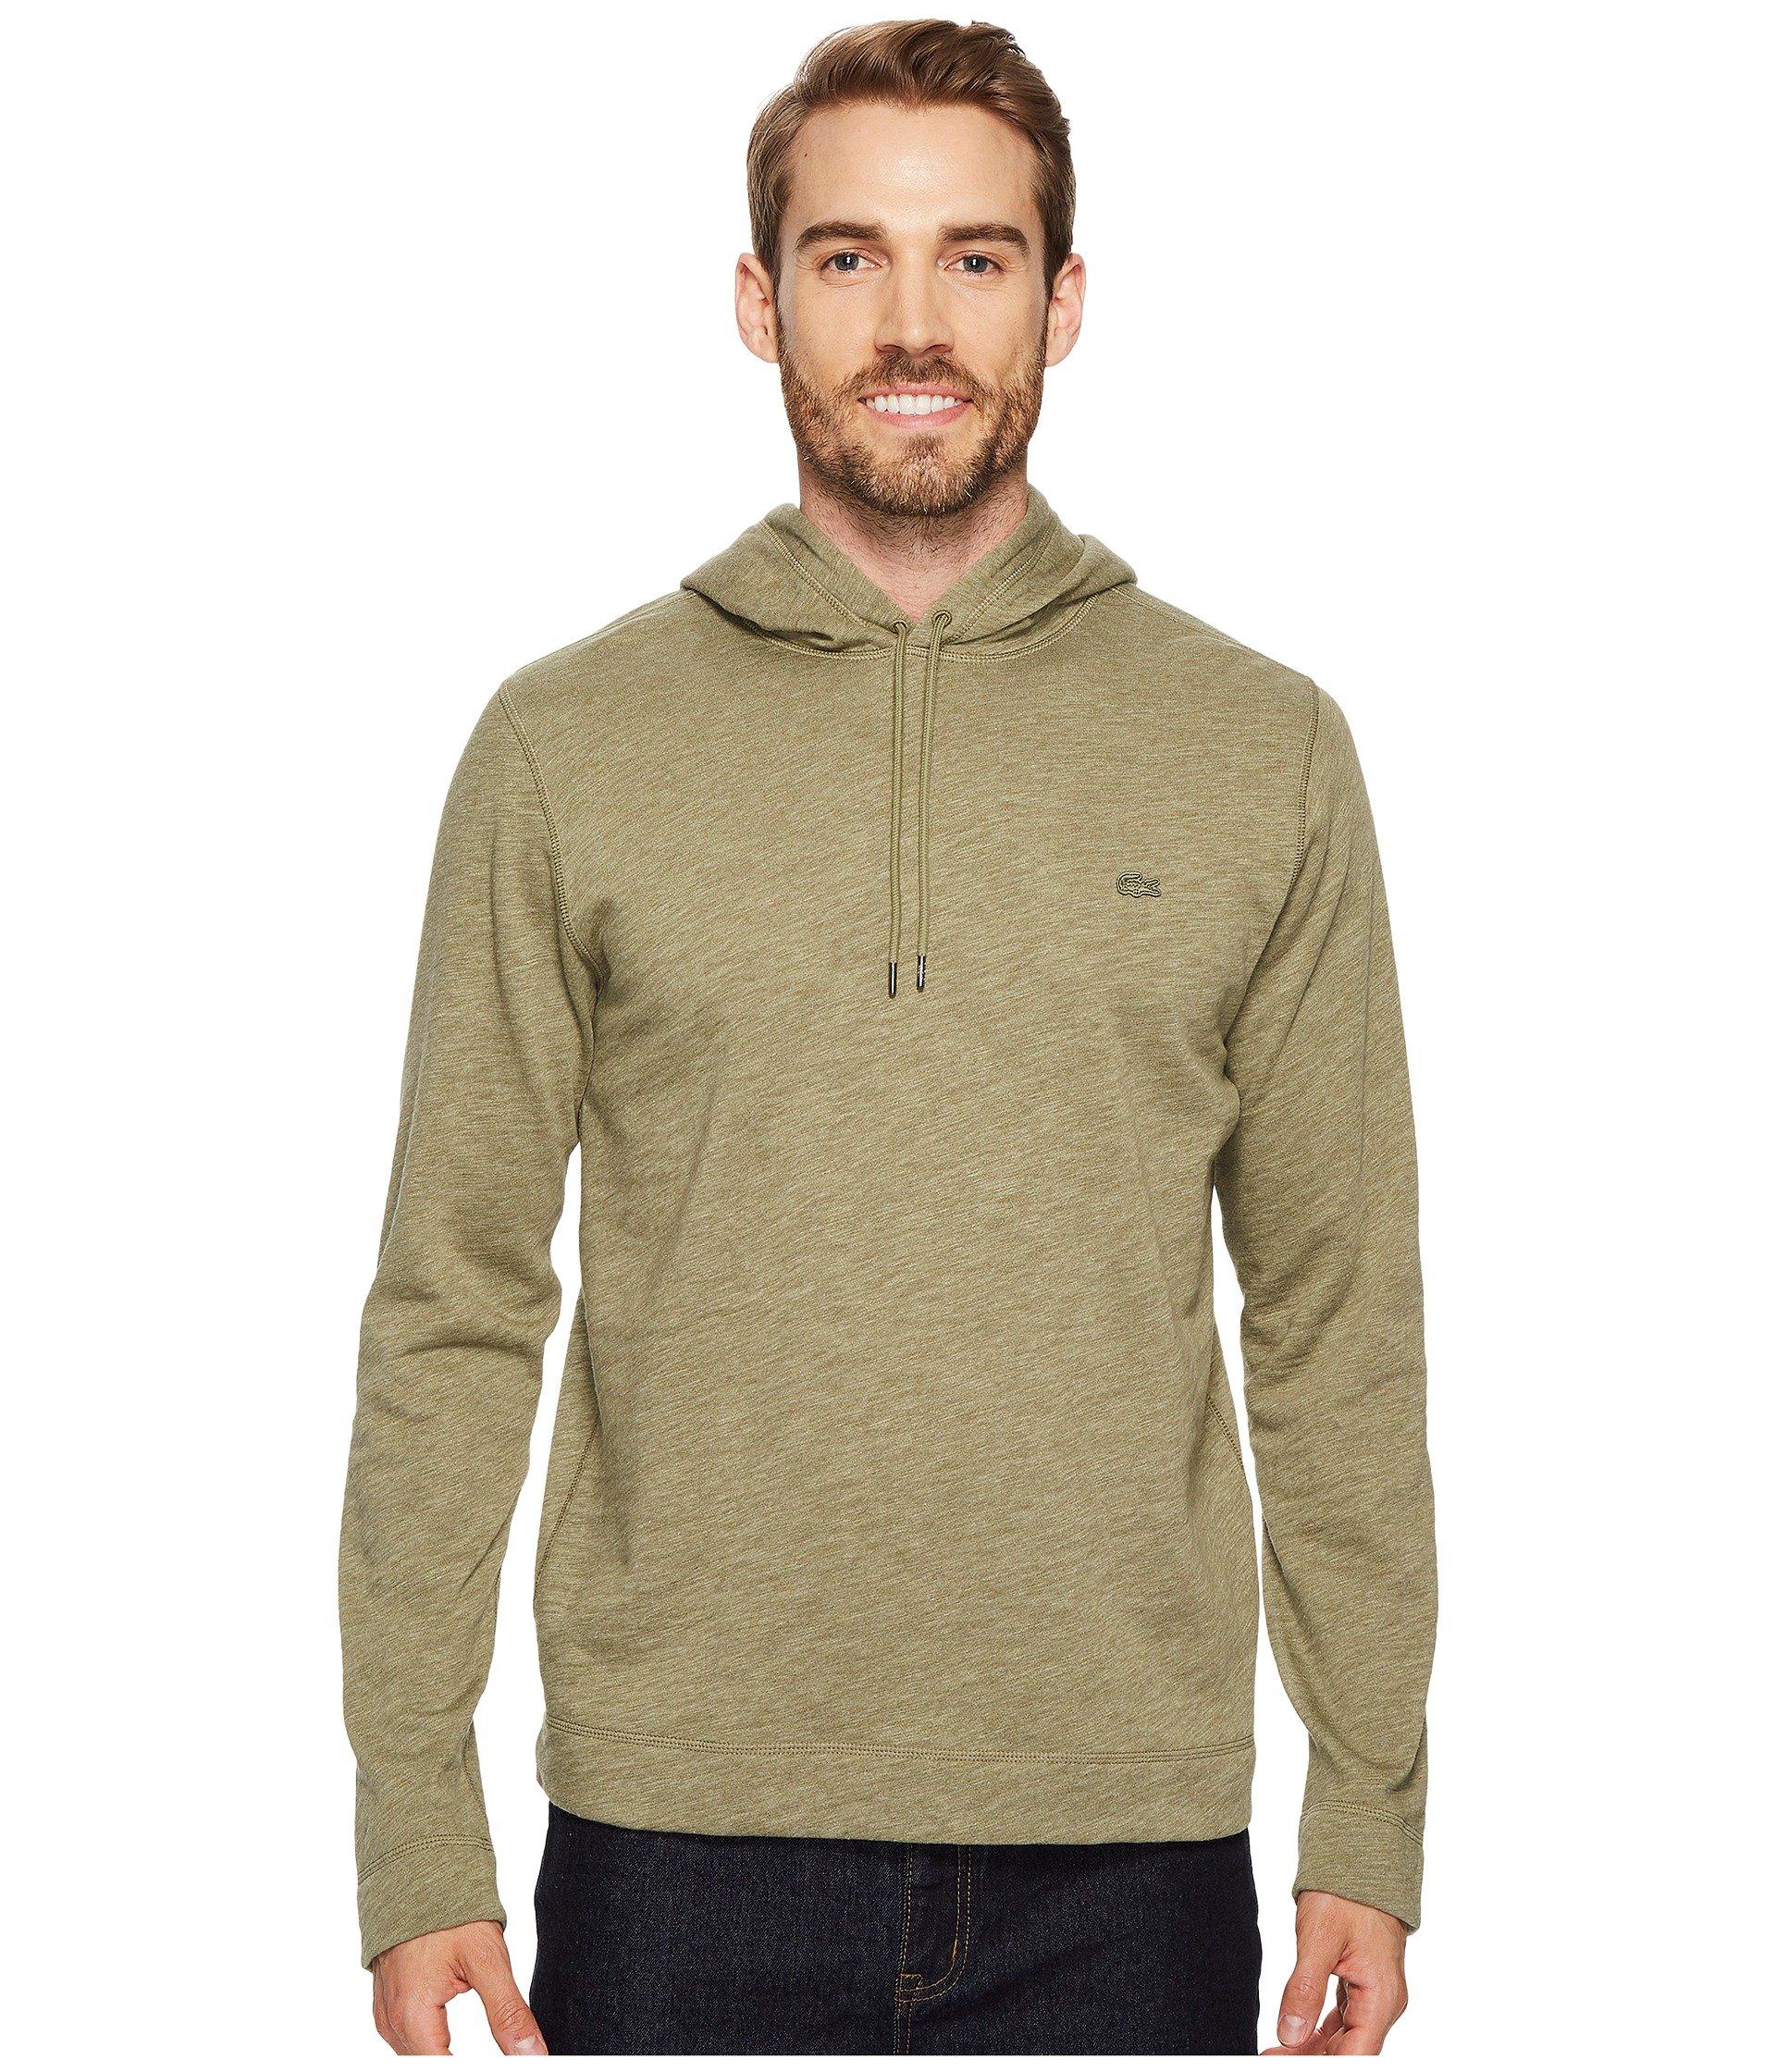 Buzo o Chaqueta Deportiva para Hombre Lacoste Light Brushed Fleece Hoodie Sweatshirt  + Lacoste en VeoyCompro.net